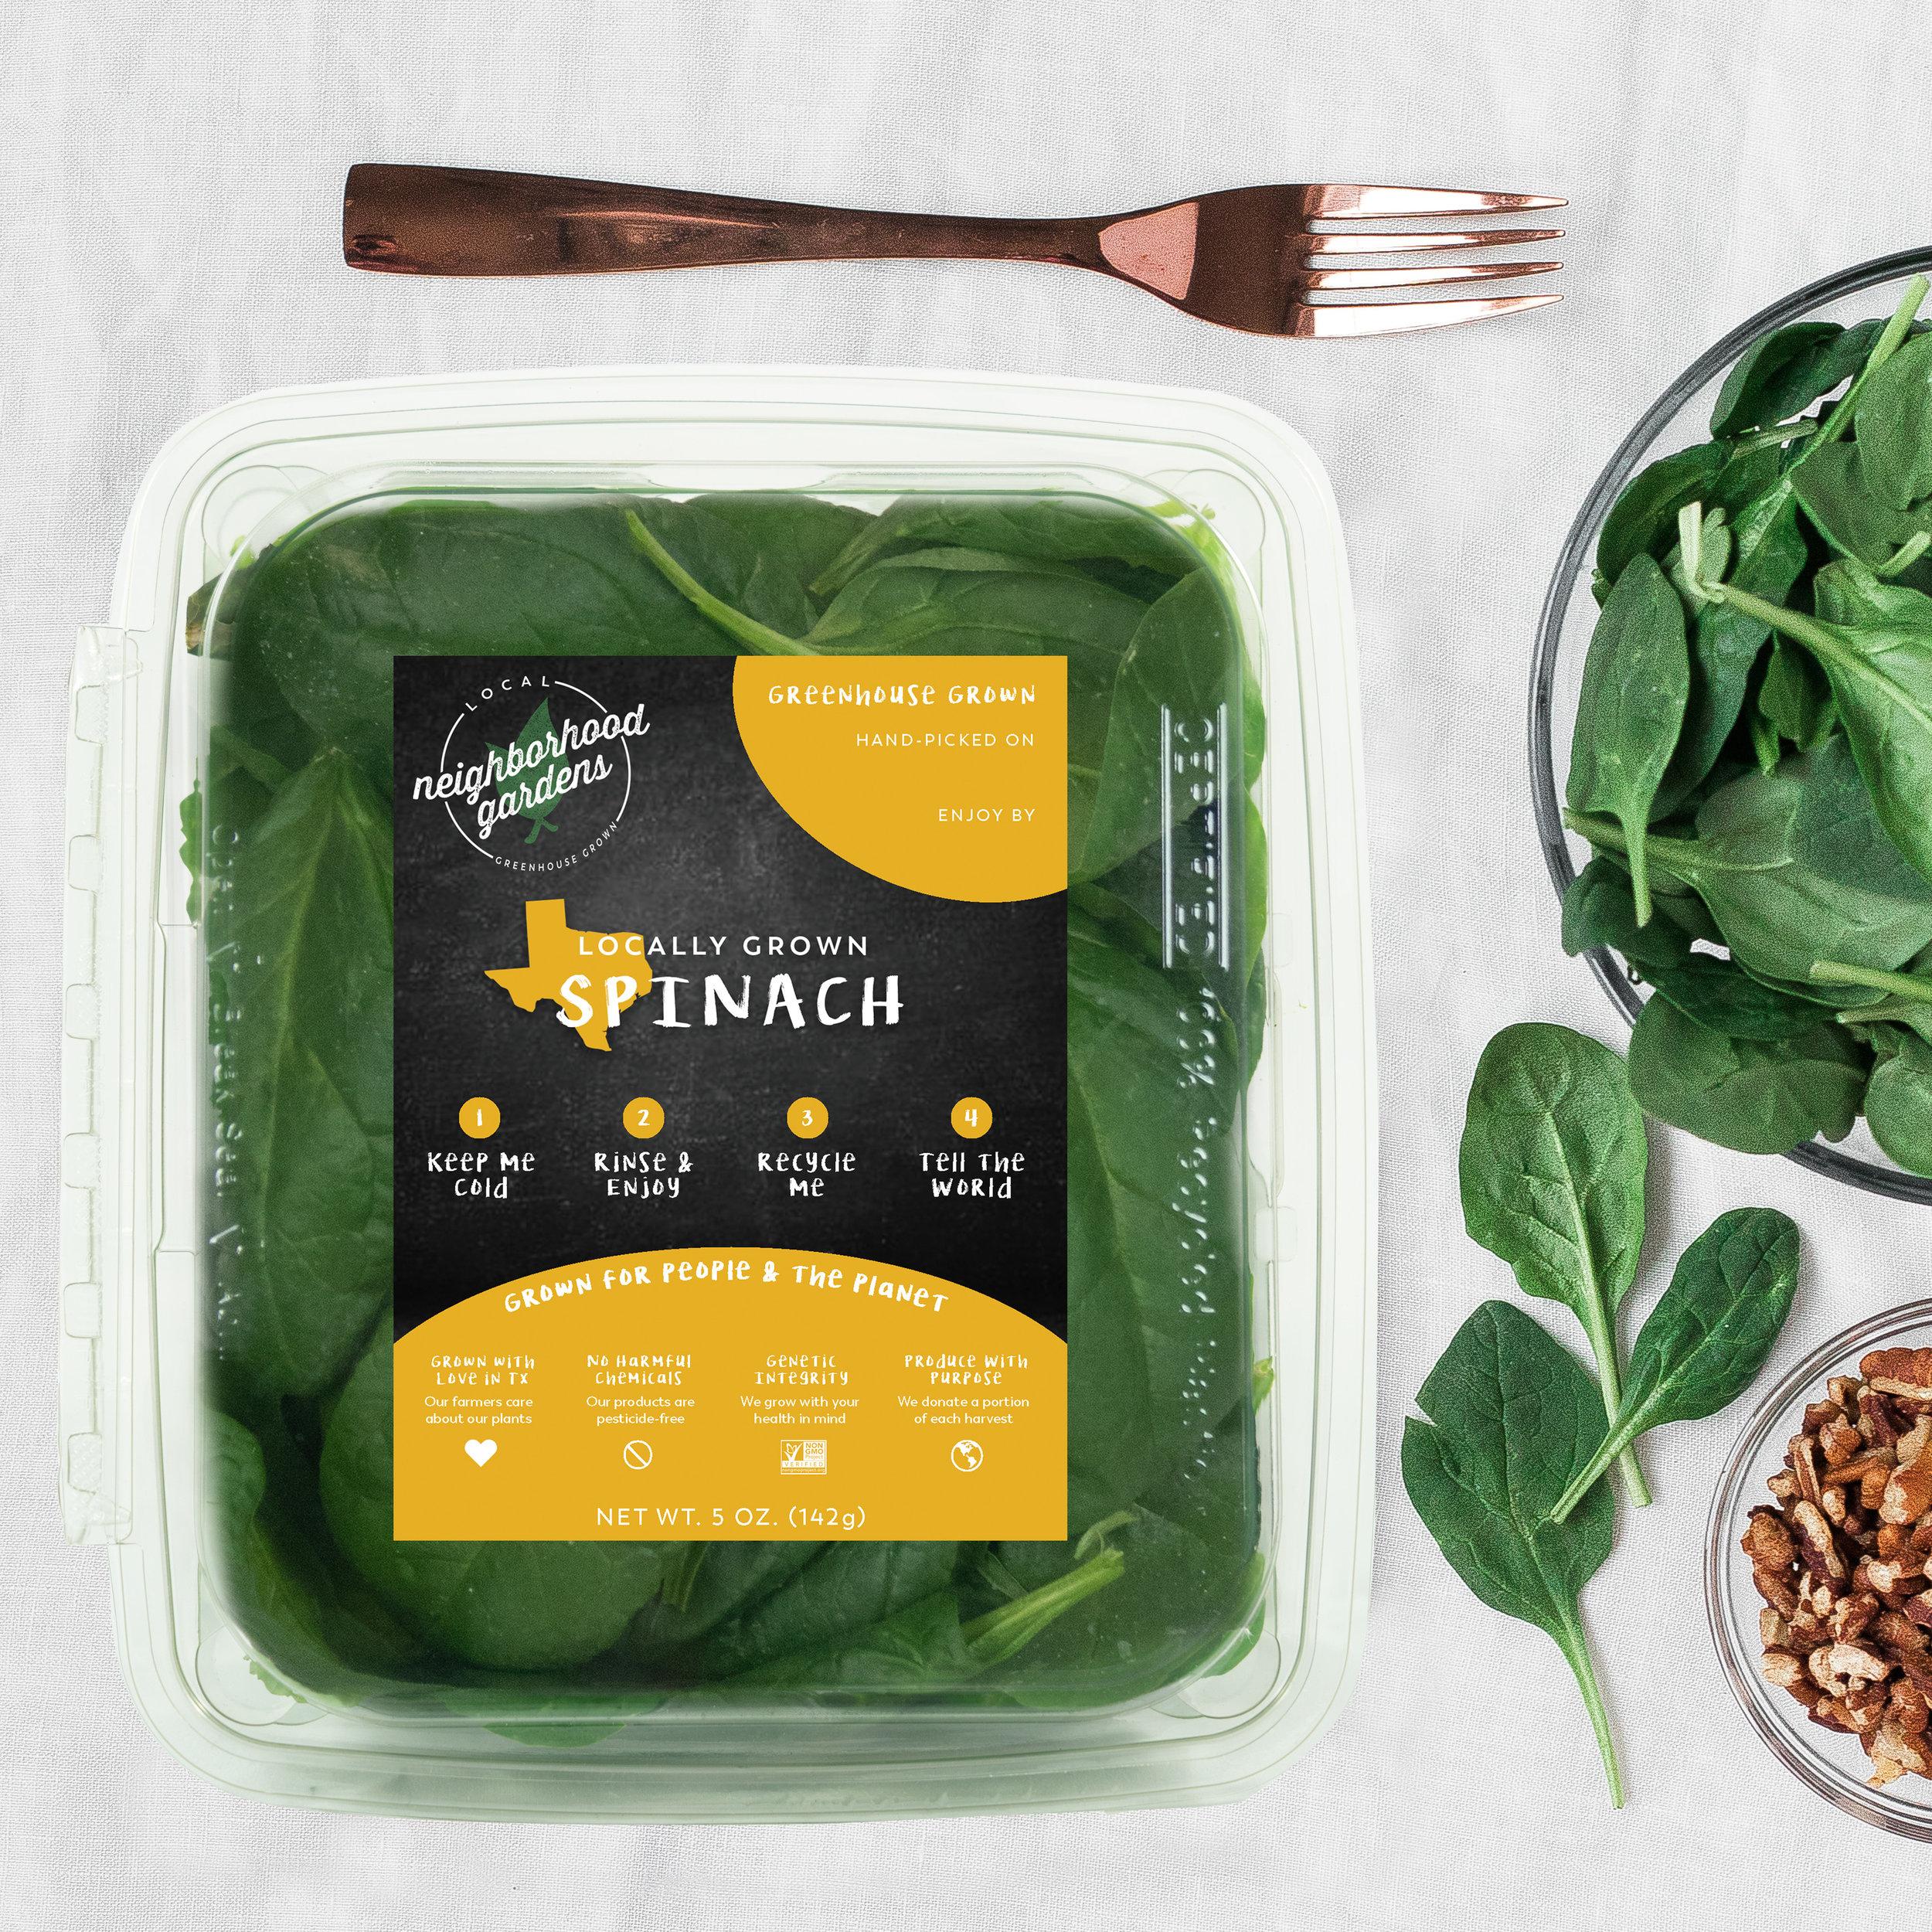 spinach promo 4.jpg